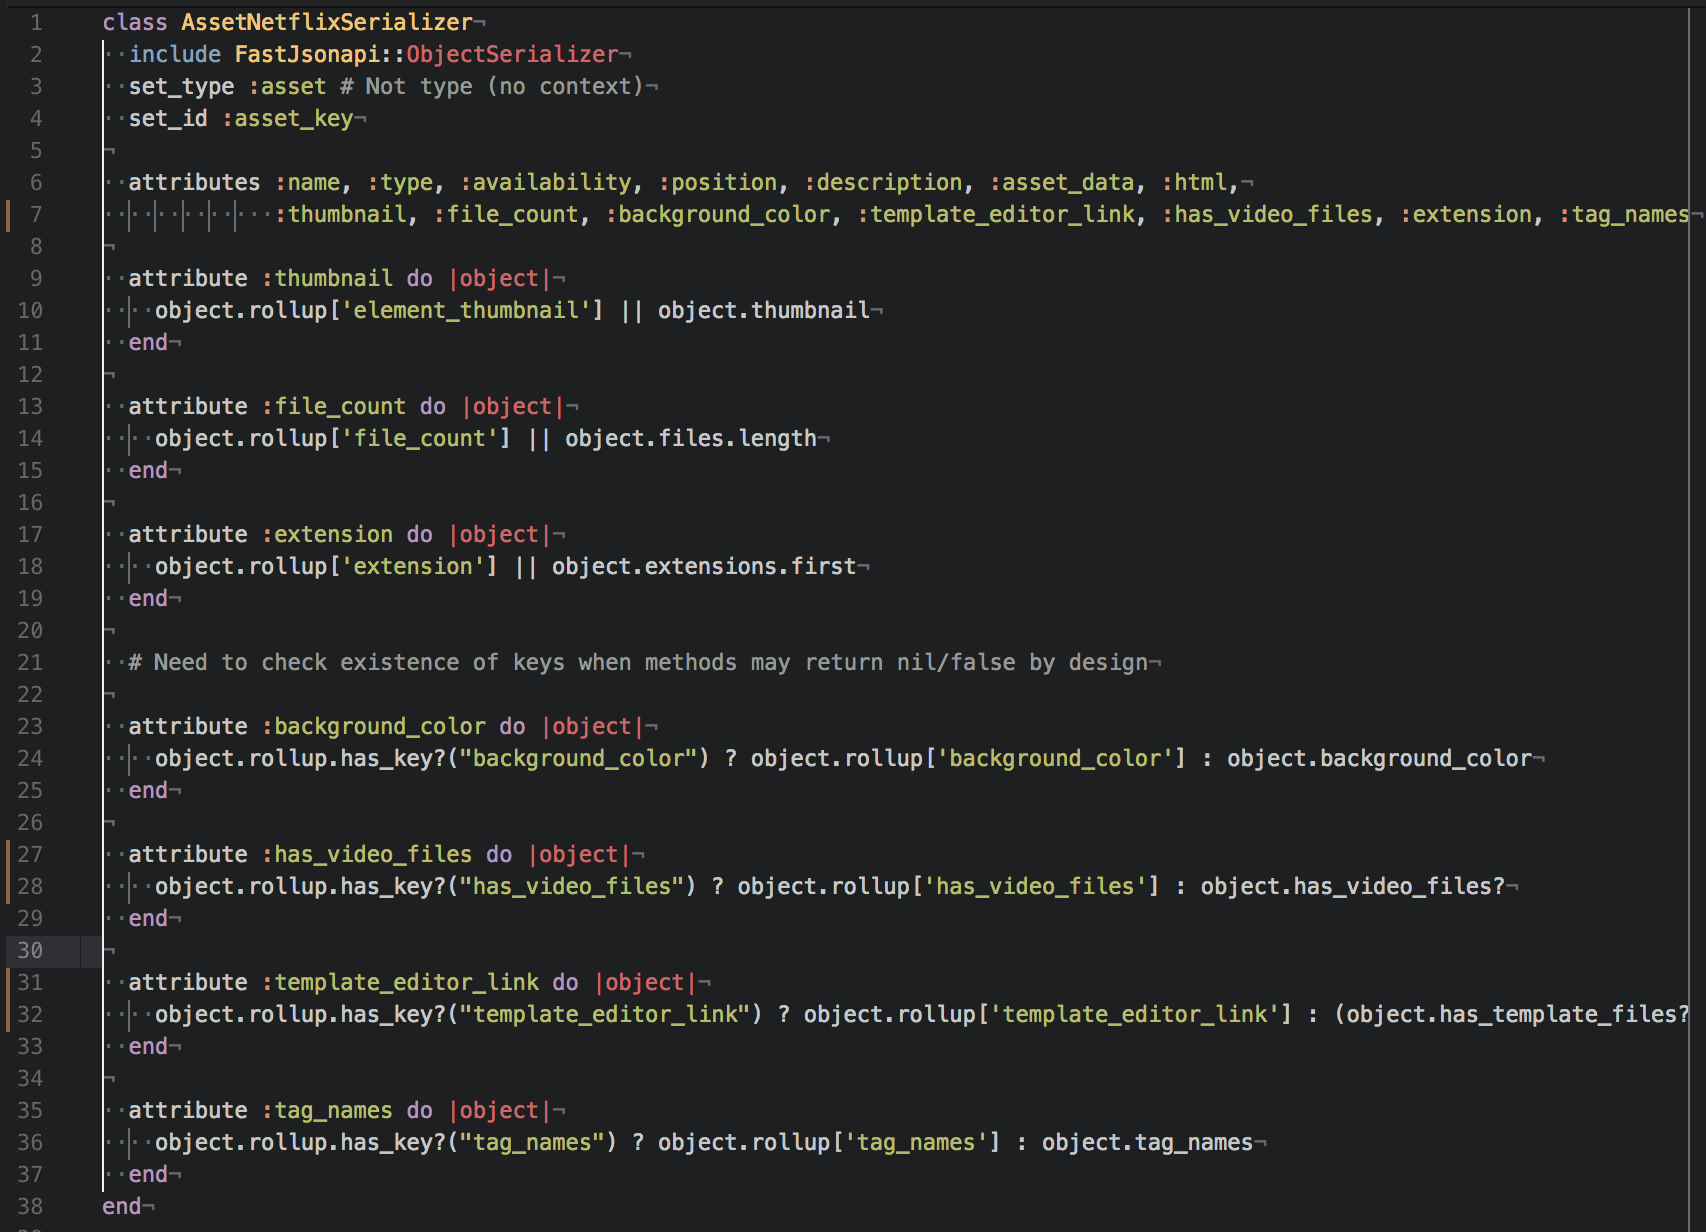 asset netflix serializer example code